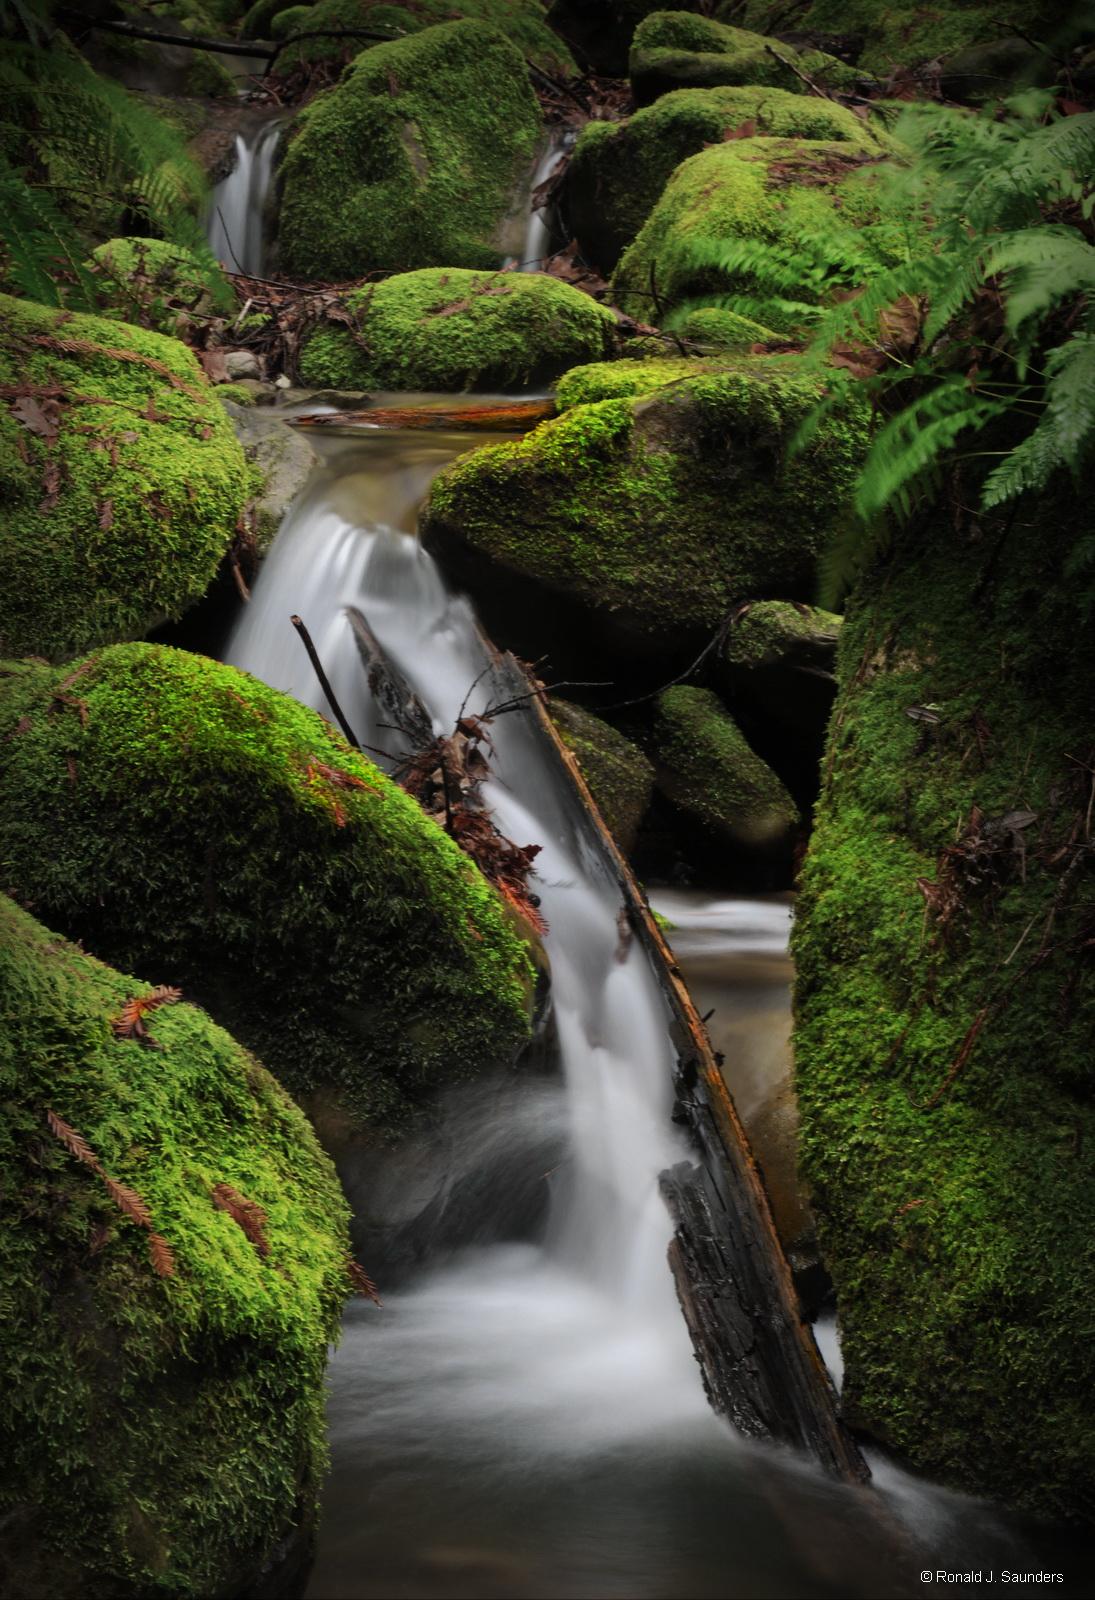 redwoods, california, falls, water, moss, rocks, stream, ferns, ron, ron saunders, ronald, ronald j saunders, prints, photo